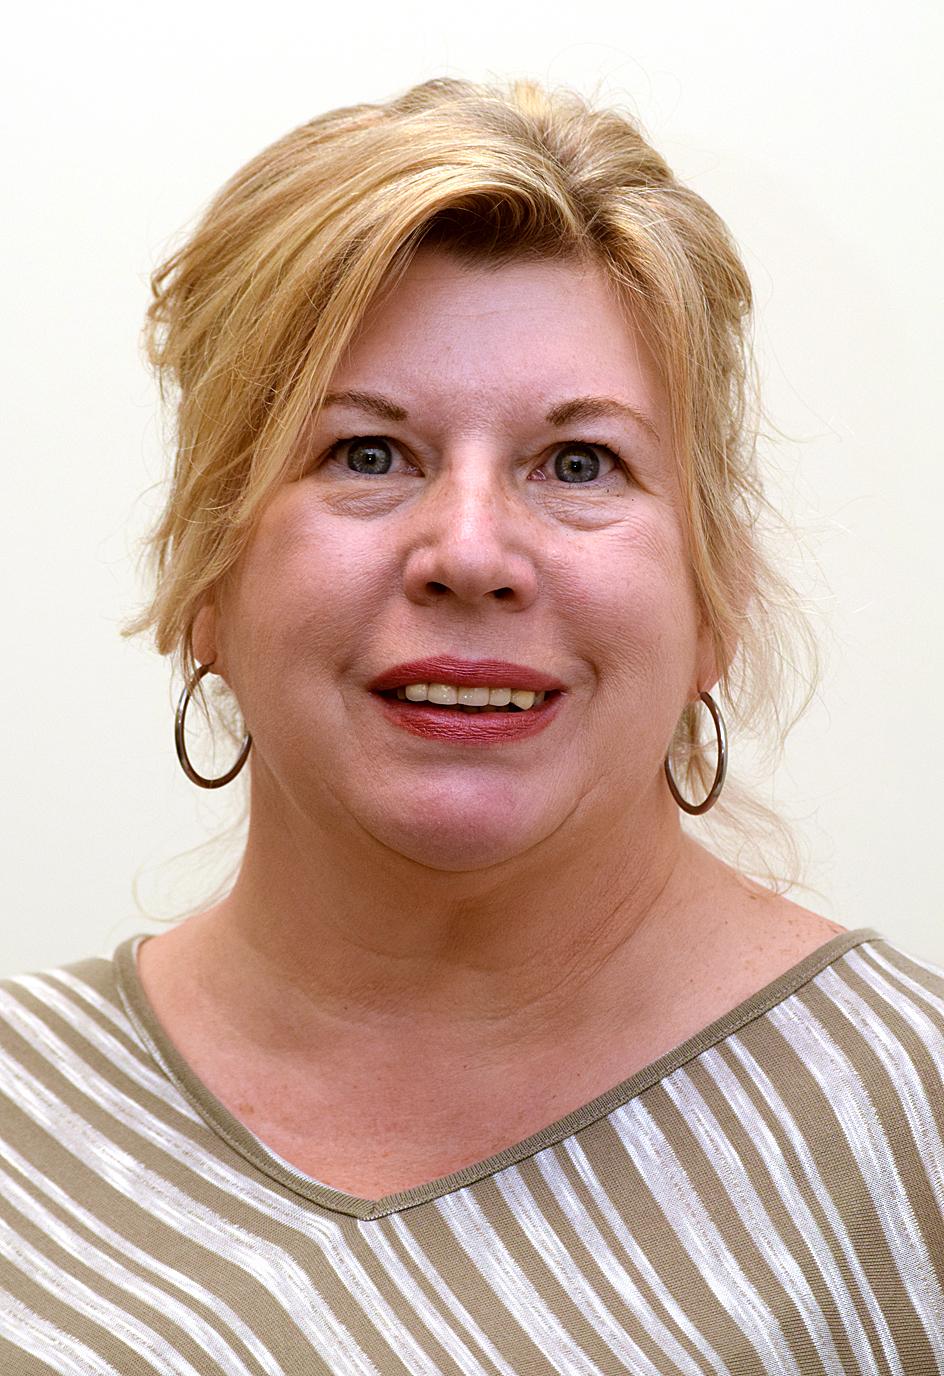 Bonnie Williams - City Clerk   910-642-8046  EXT-1007 910-642-6004 (fax)  bwilliams@ci.whiteville.nc.us